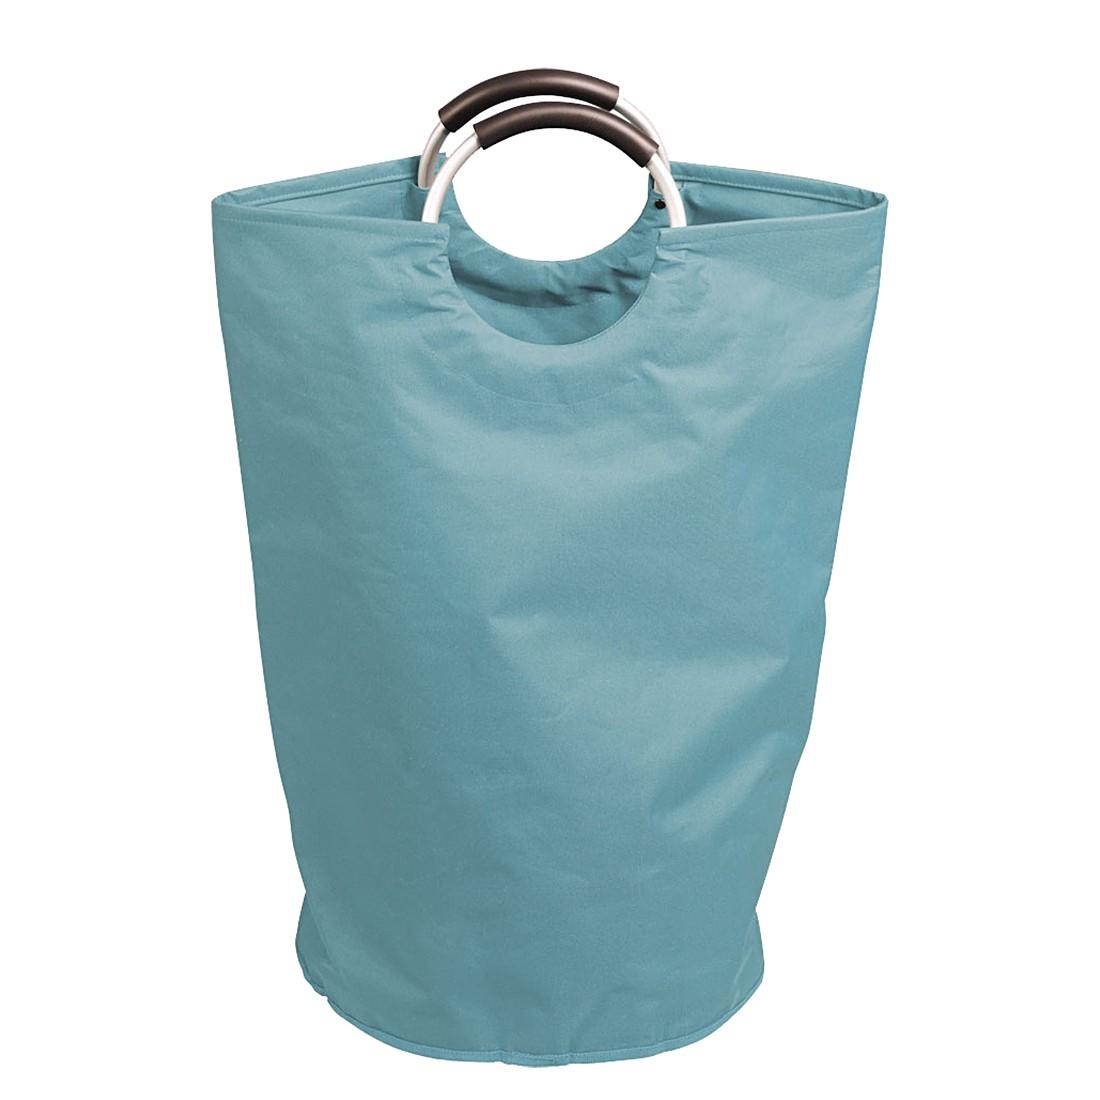 Wäschetasche Elsa – Aqua, Sanwood jetzt kaufen